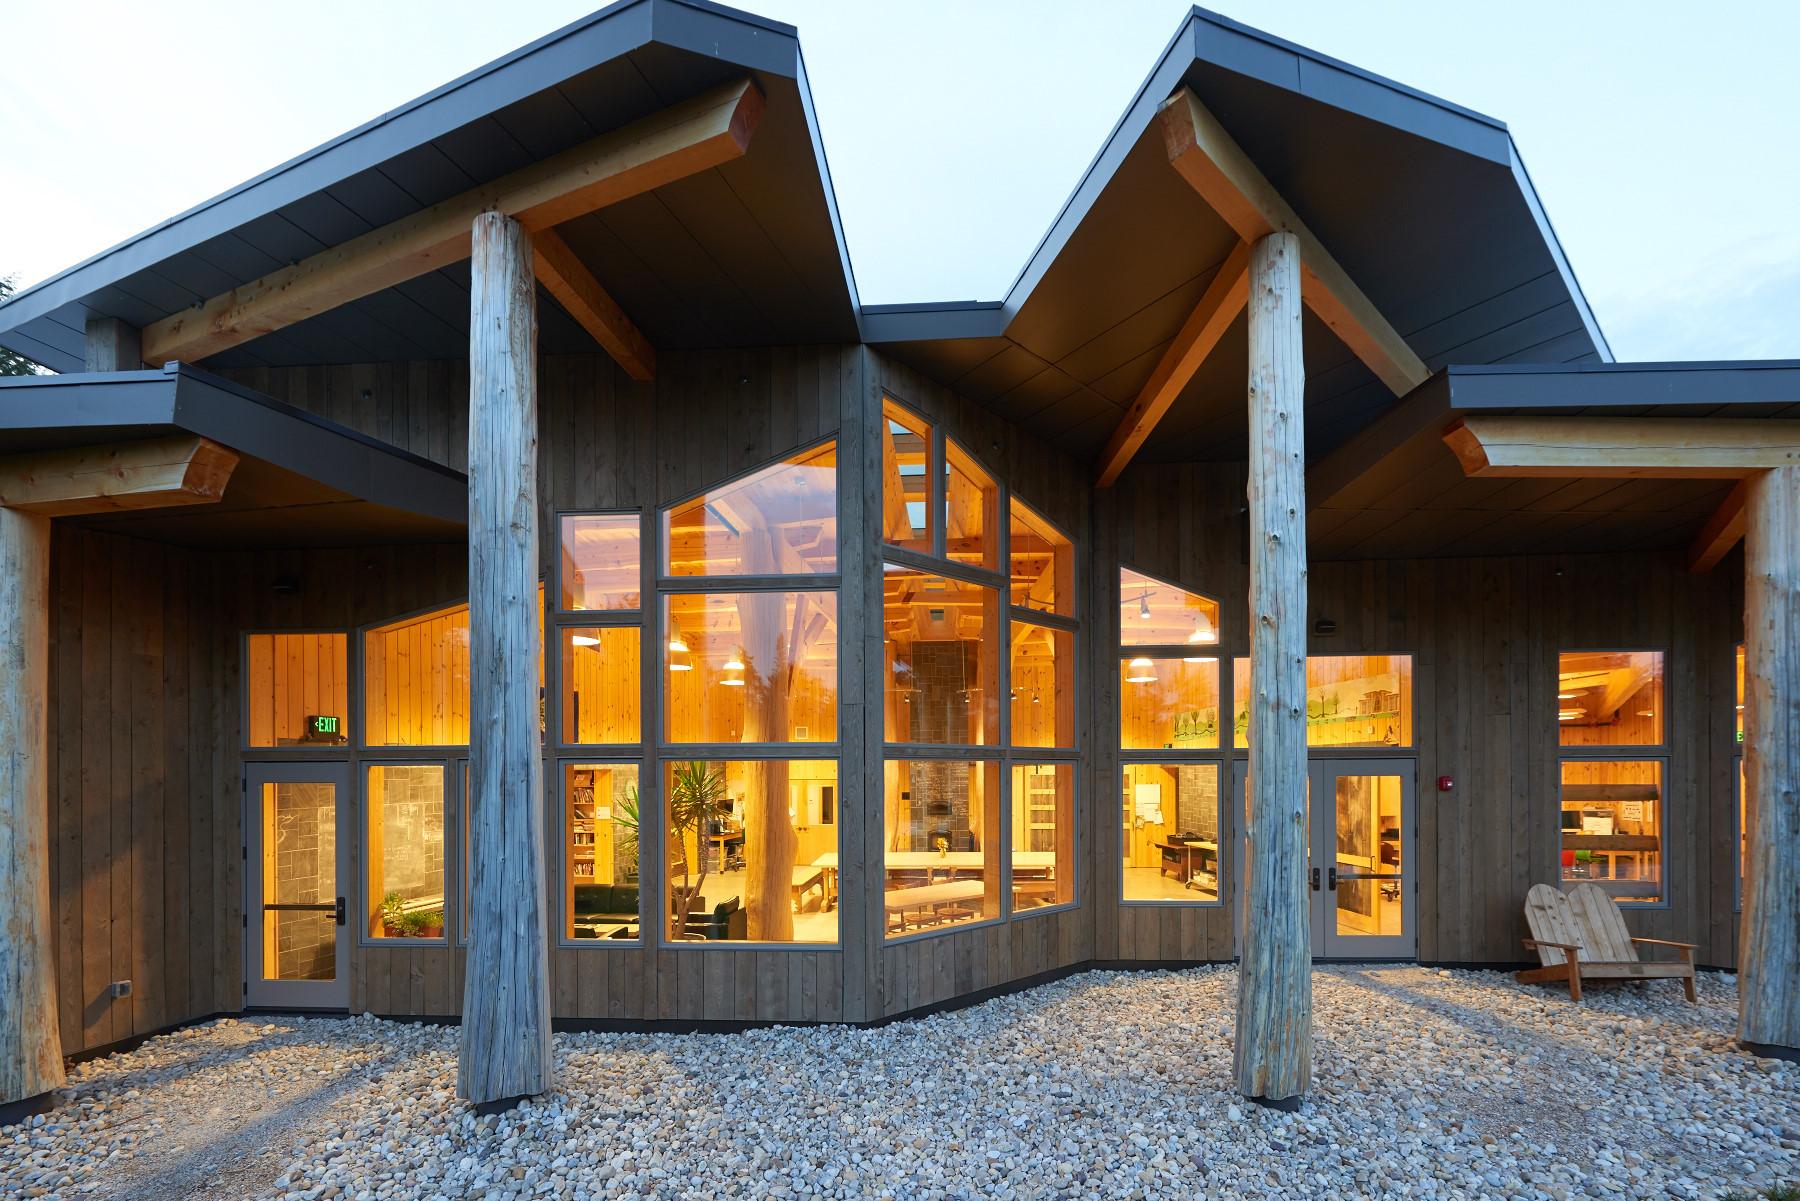 2015 Wood Design Award Winners Announced, Burr Burton Academy Mountain Campus / Bensonwood +Annette Dey, PE © Marvin Windows